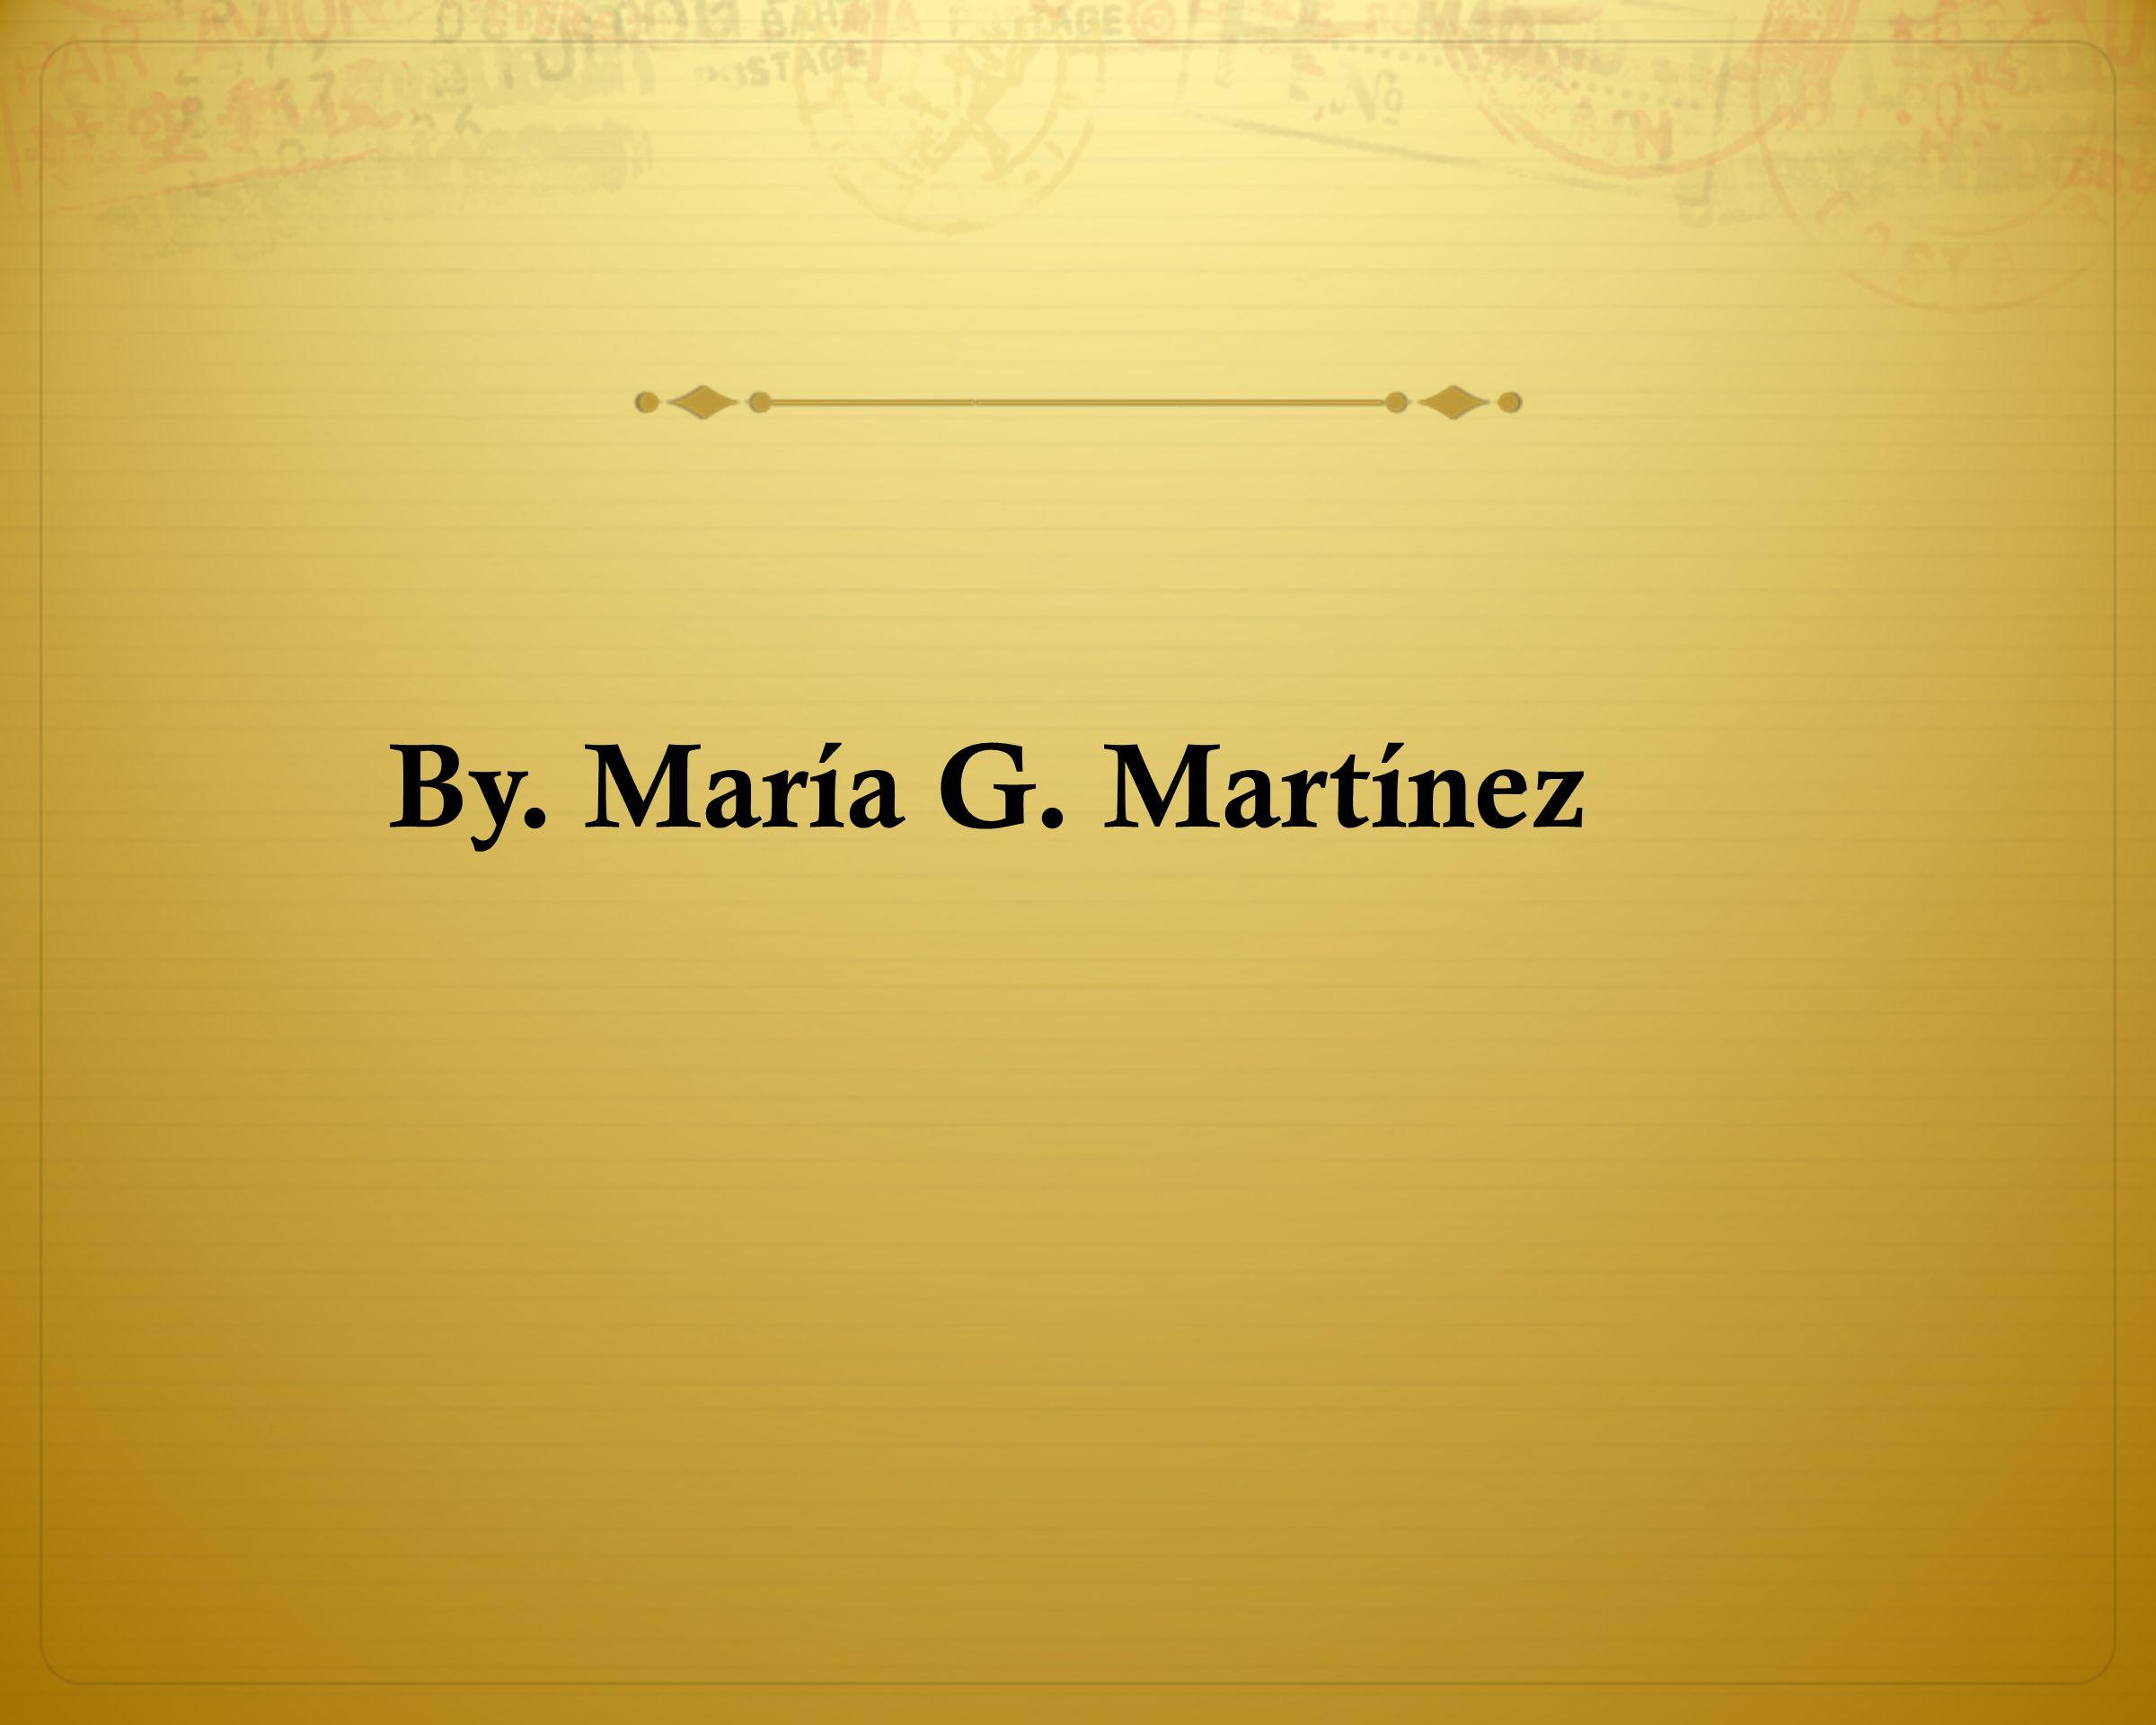 By. María G. Martínez